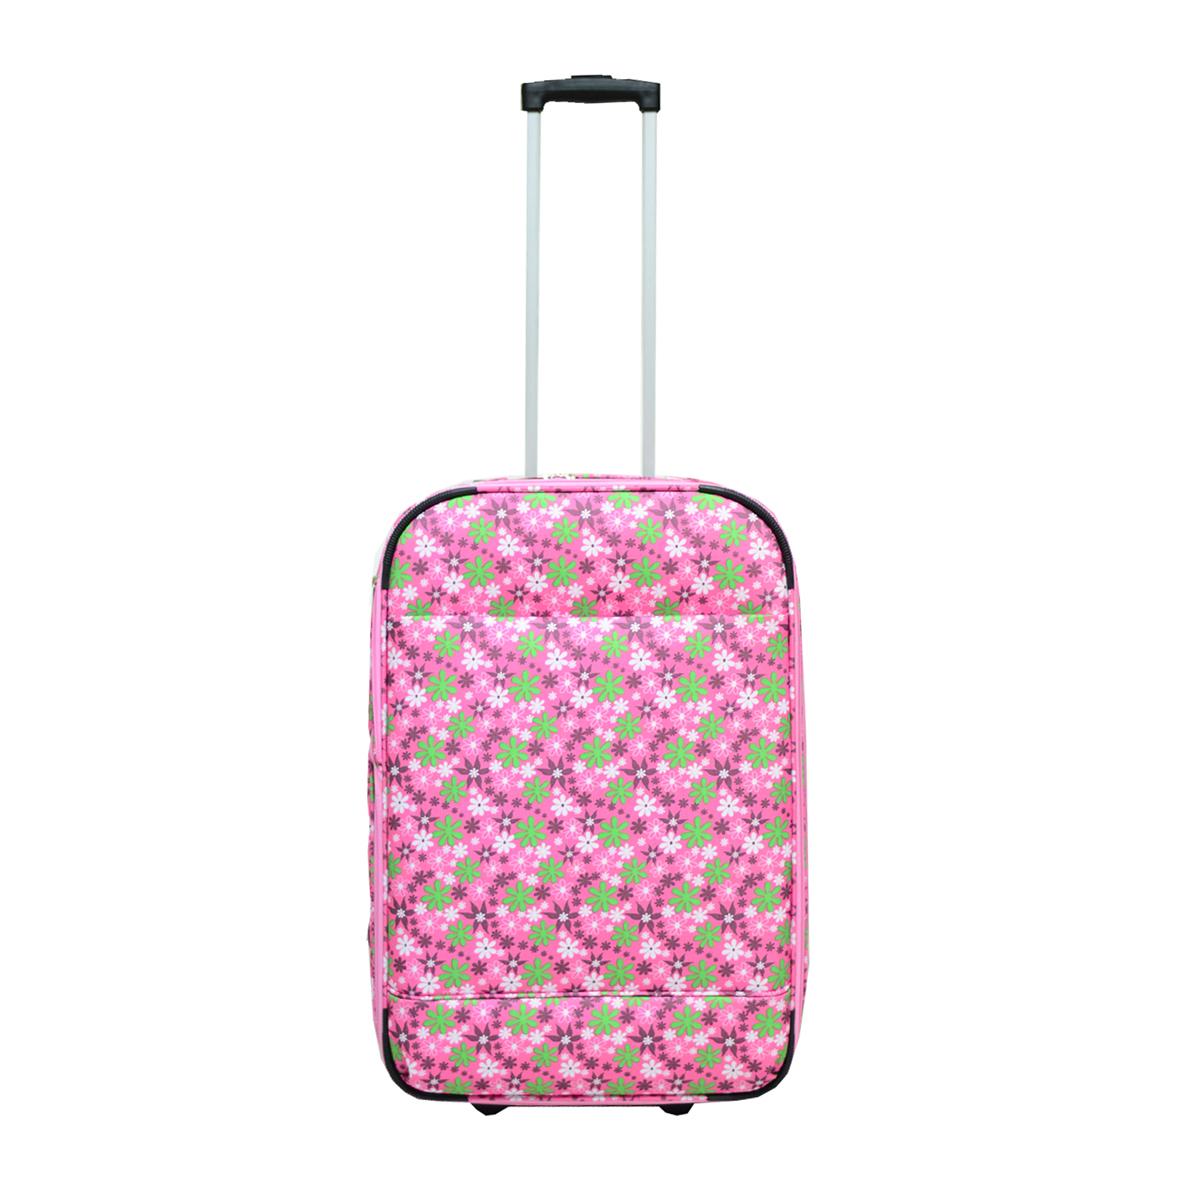 Cabin Size Soft Trolley Luggage